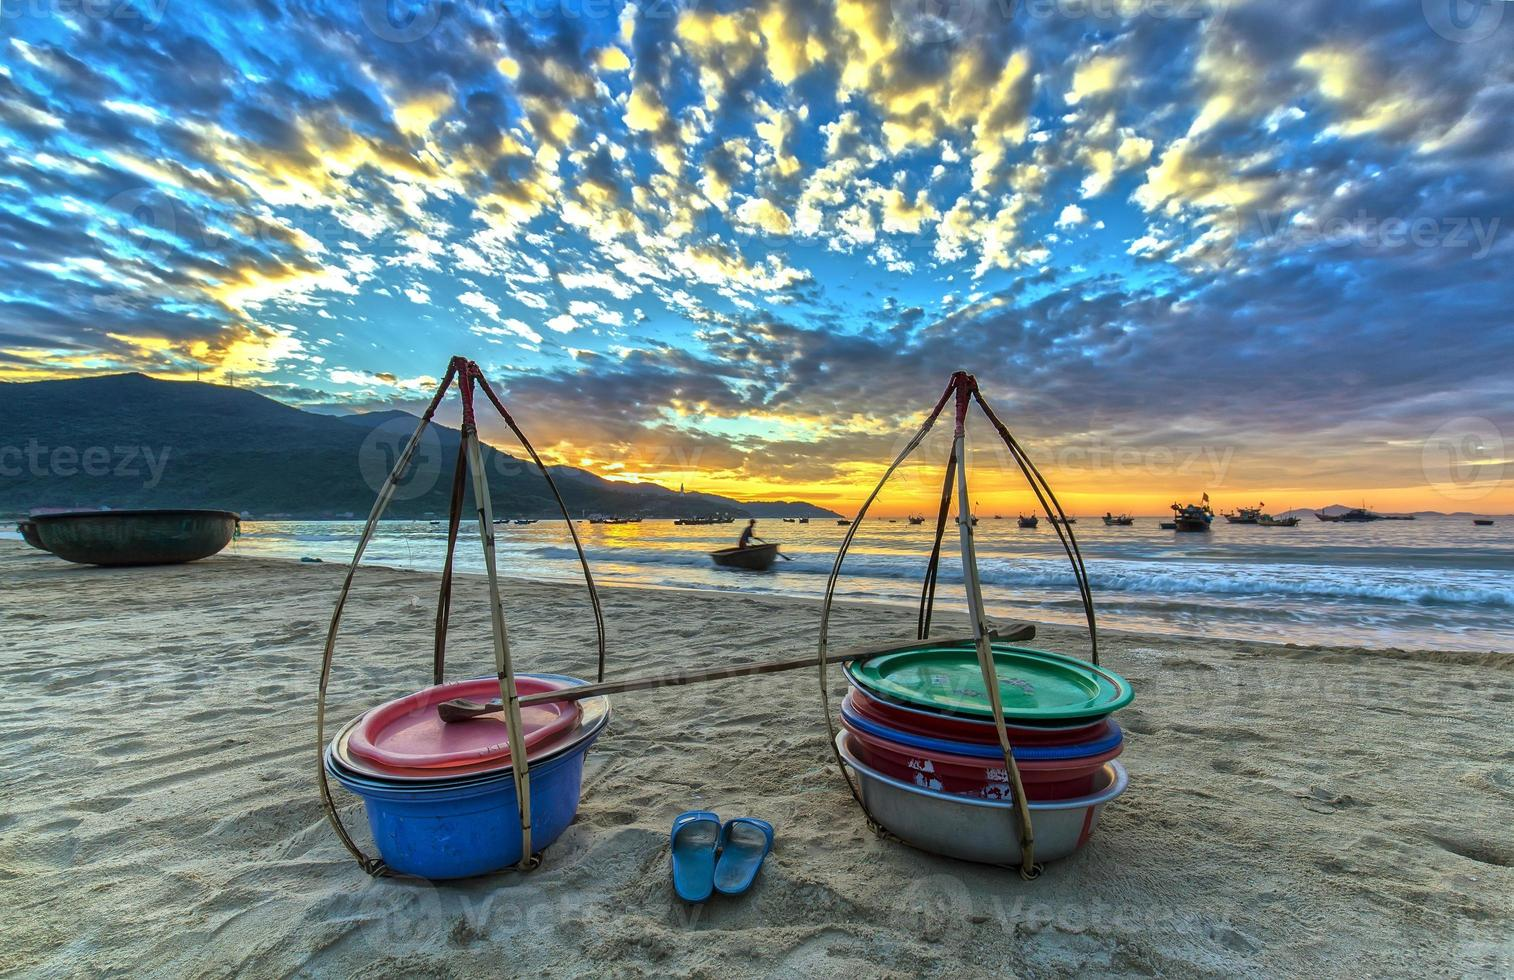 nascer do sol sobre a vila de pescadores de Danang foto